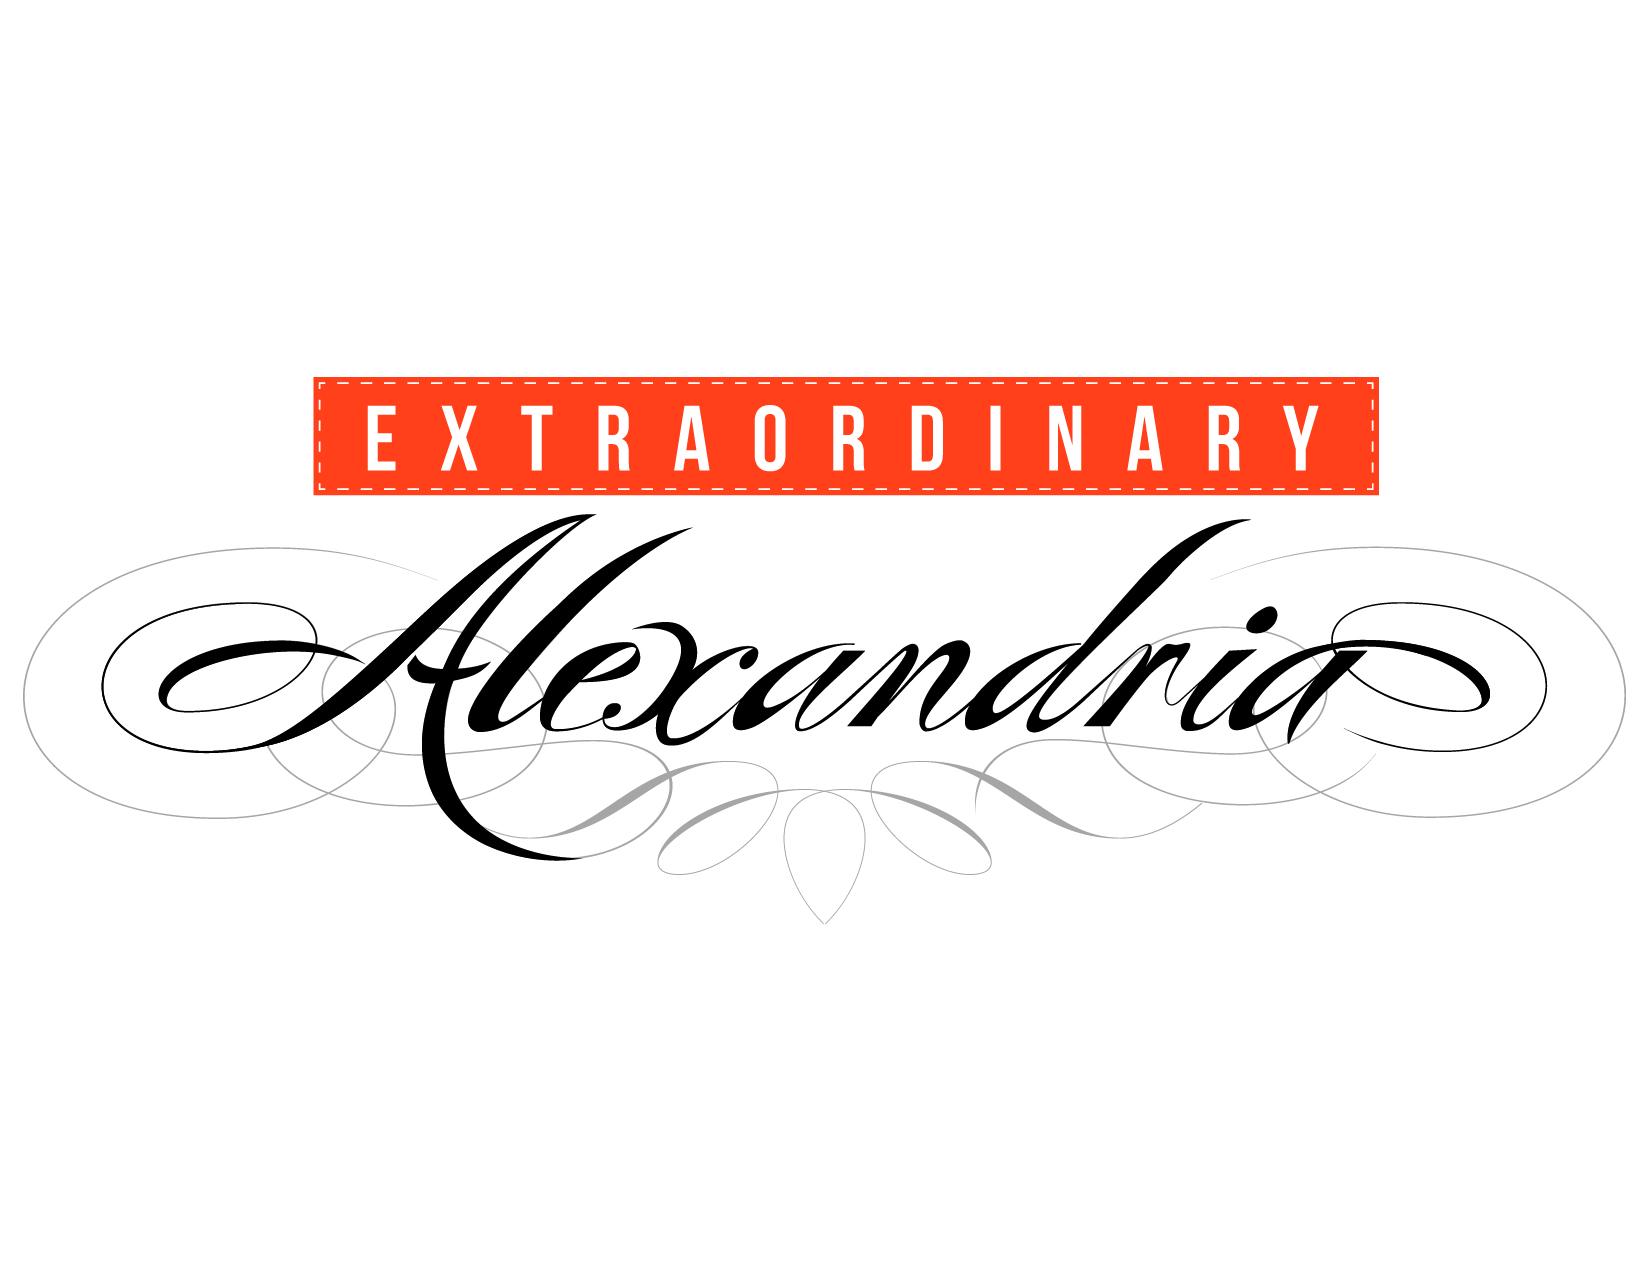 Extraordinary Alexandria Logo